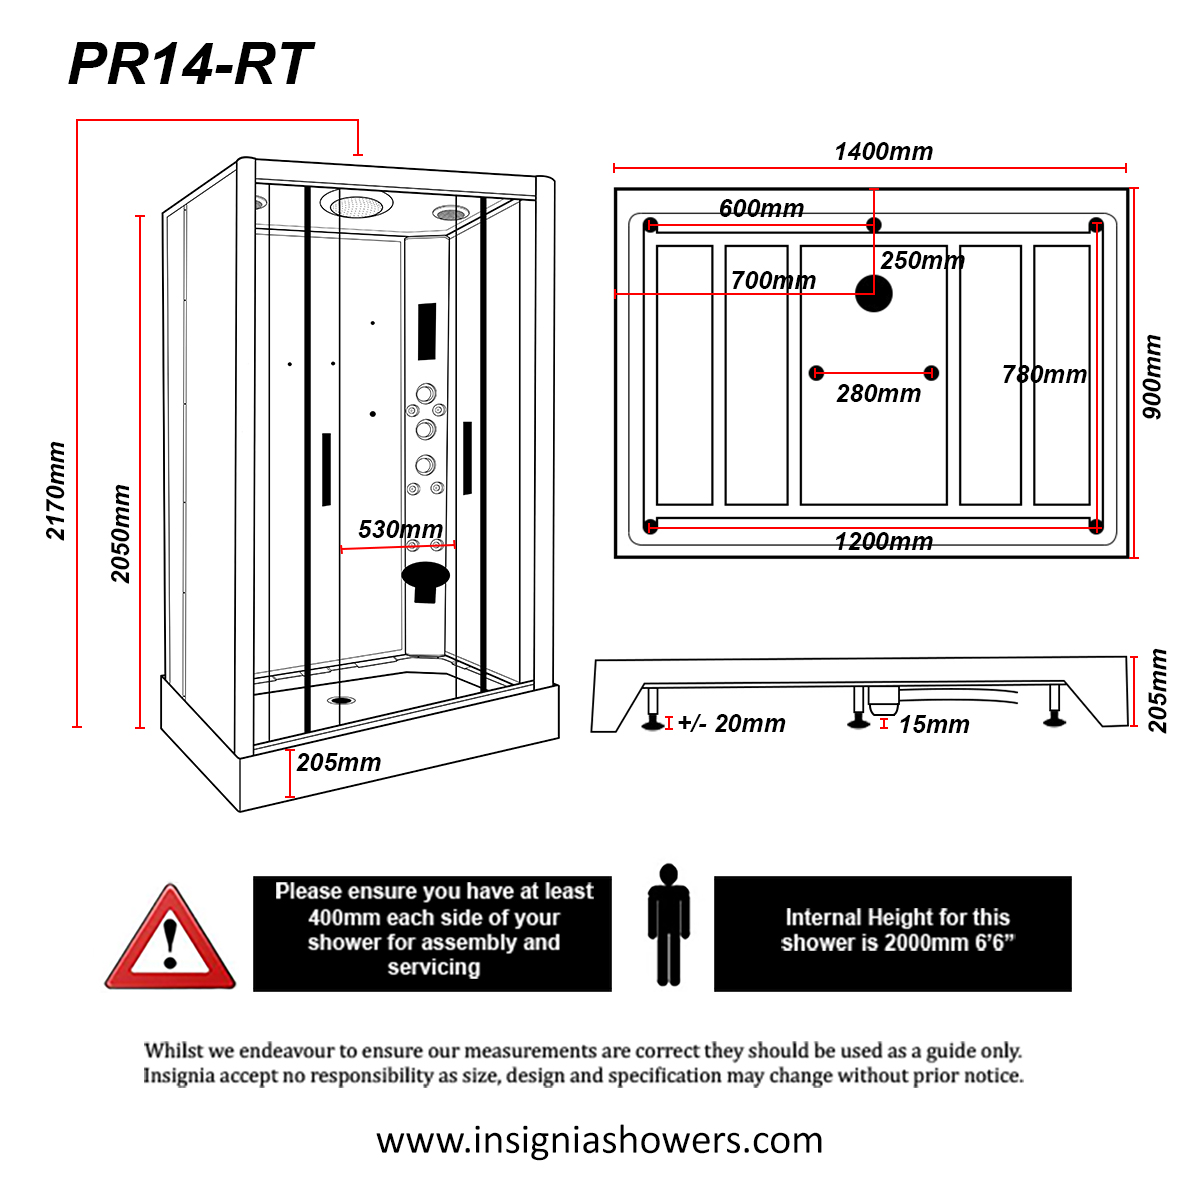 PR14-RT